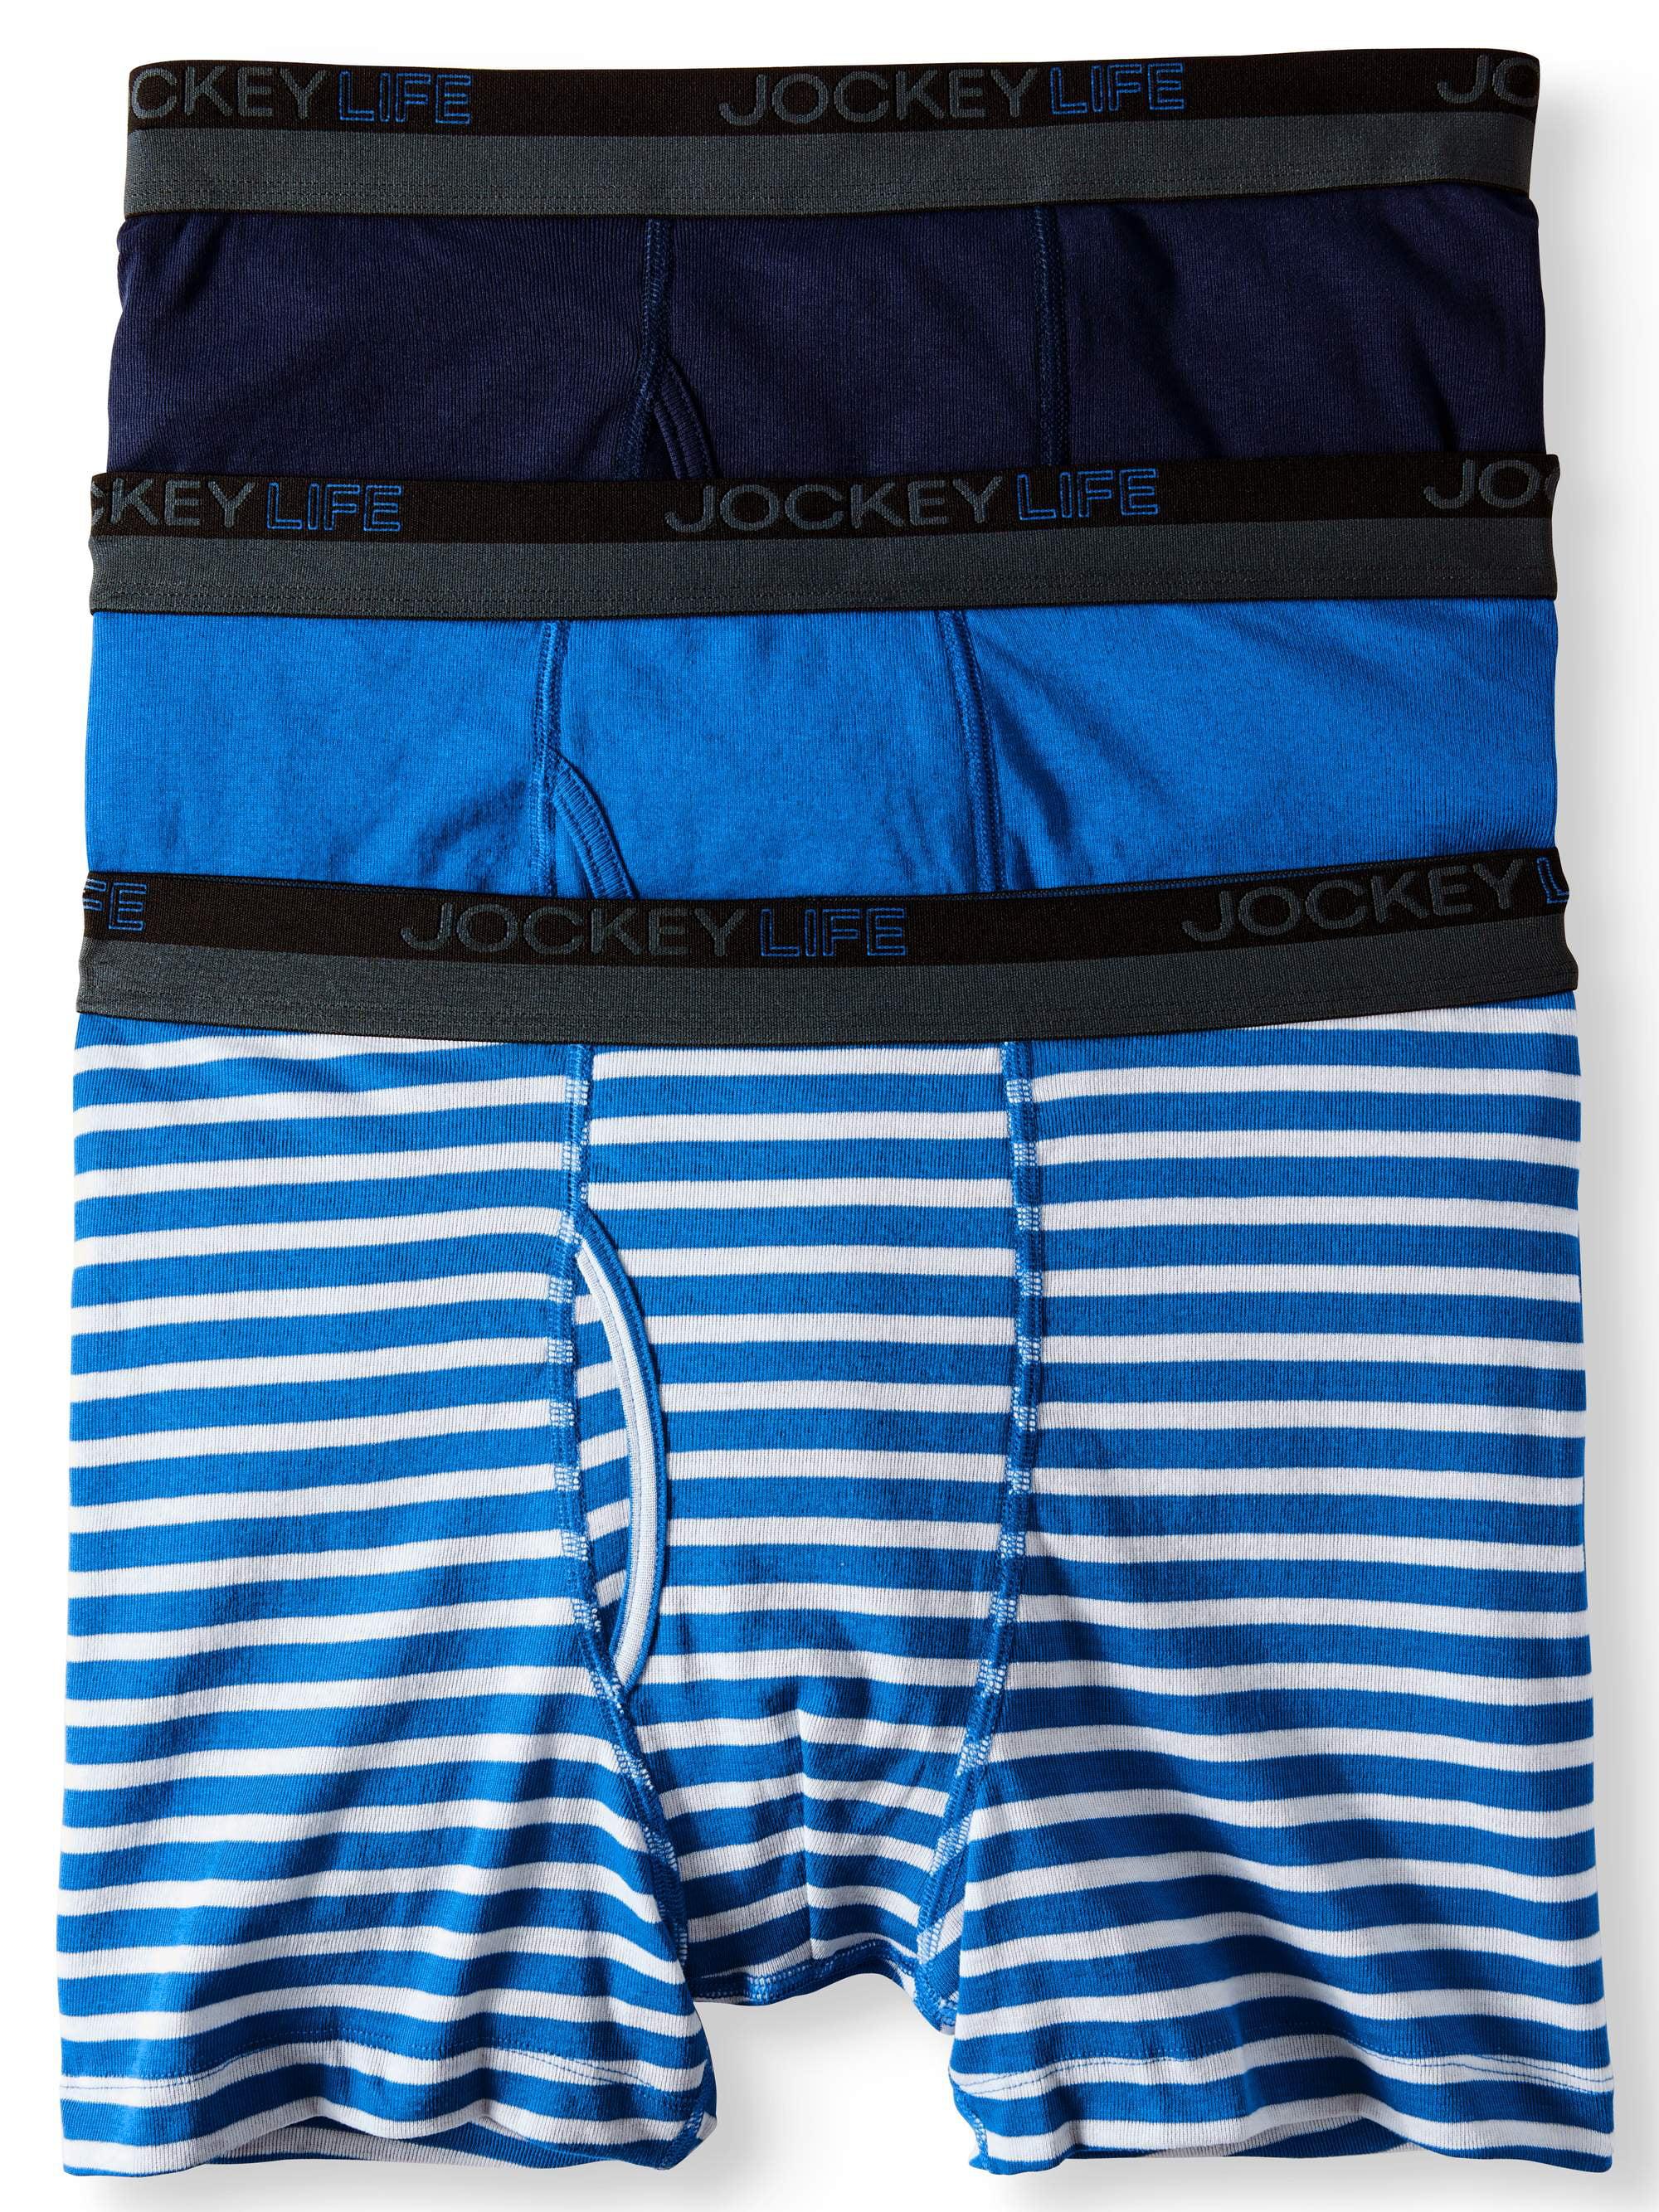 Jockey Life Men's 24/7 Comfort Cotton Blend Boxer Brief - 3 pack